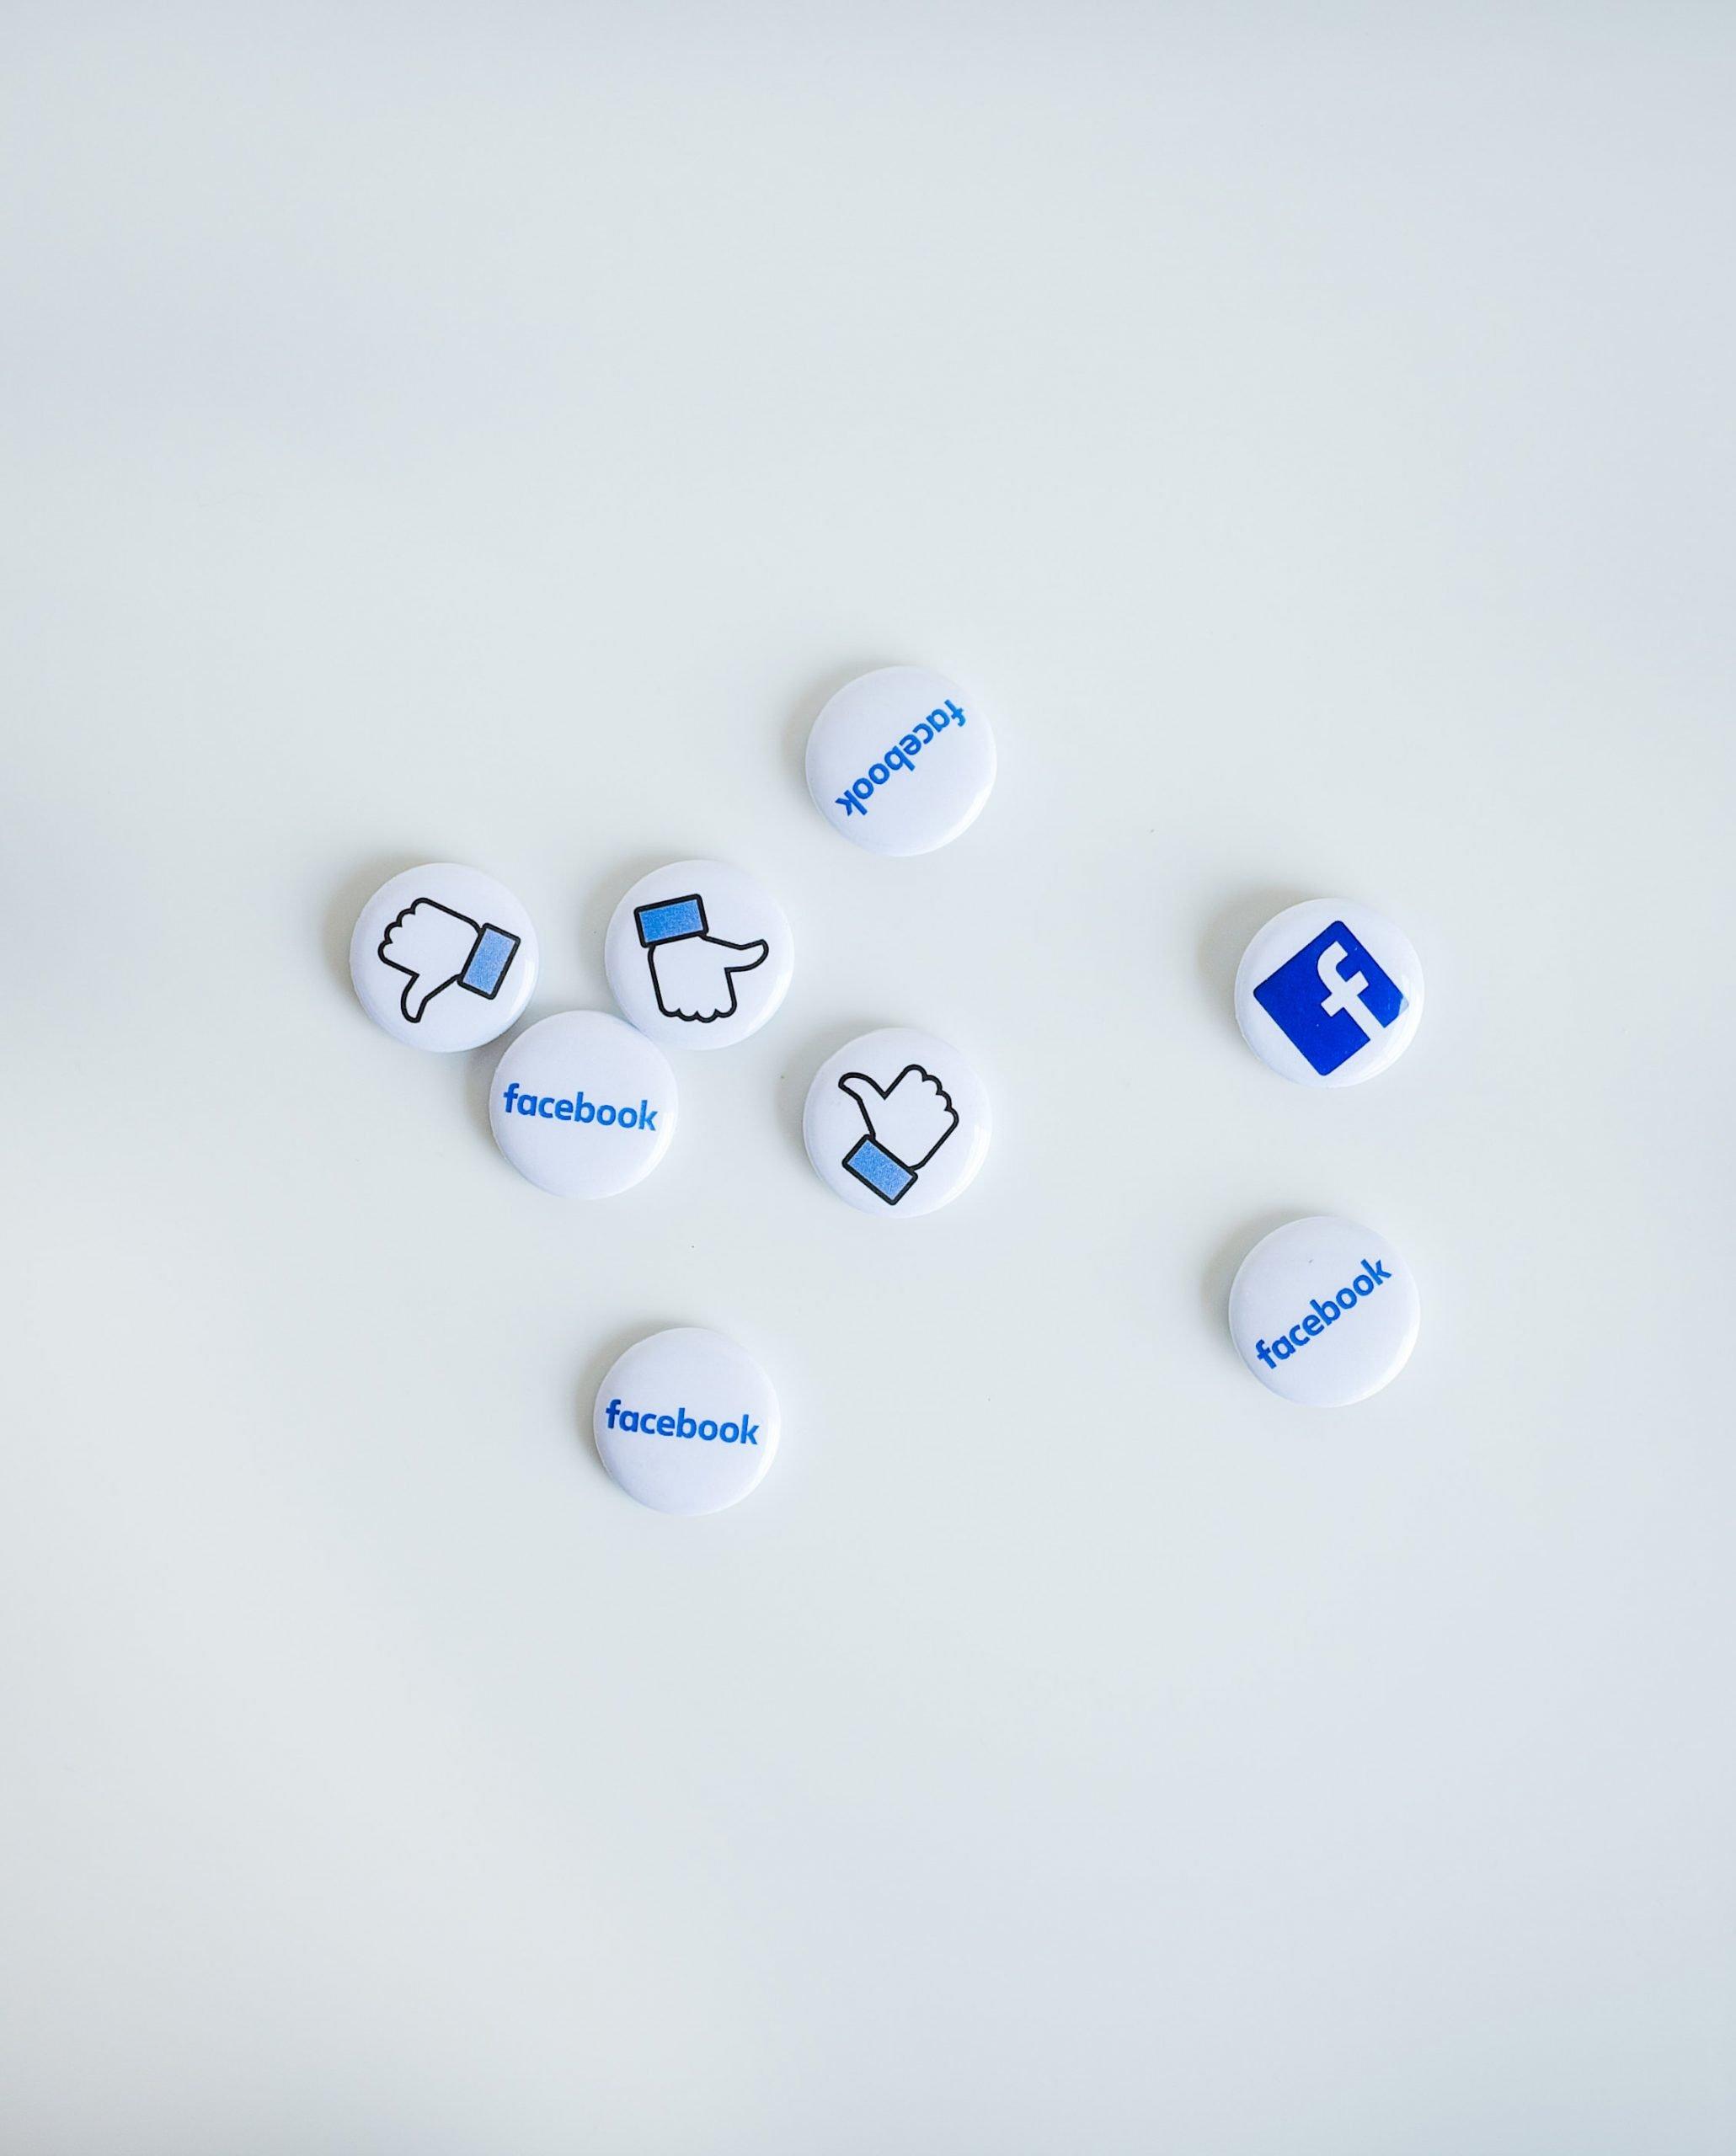 5 Essential social media management tips